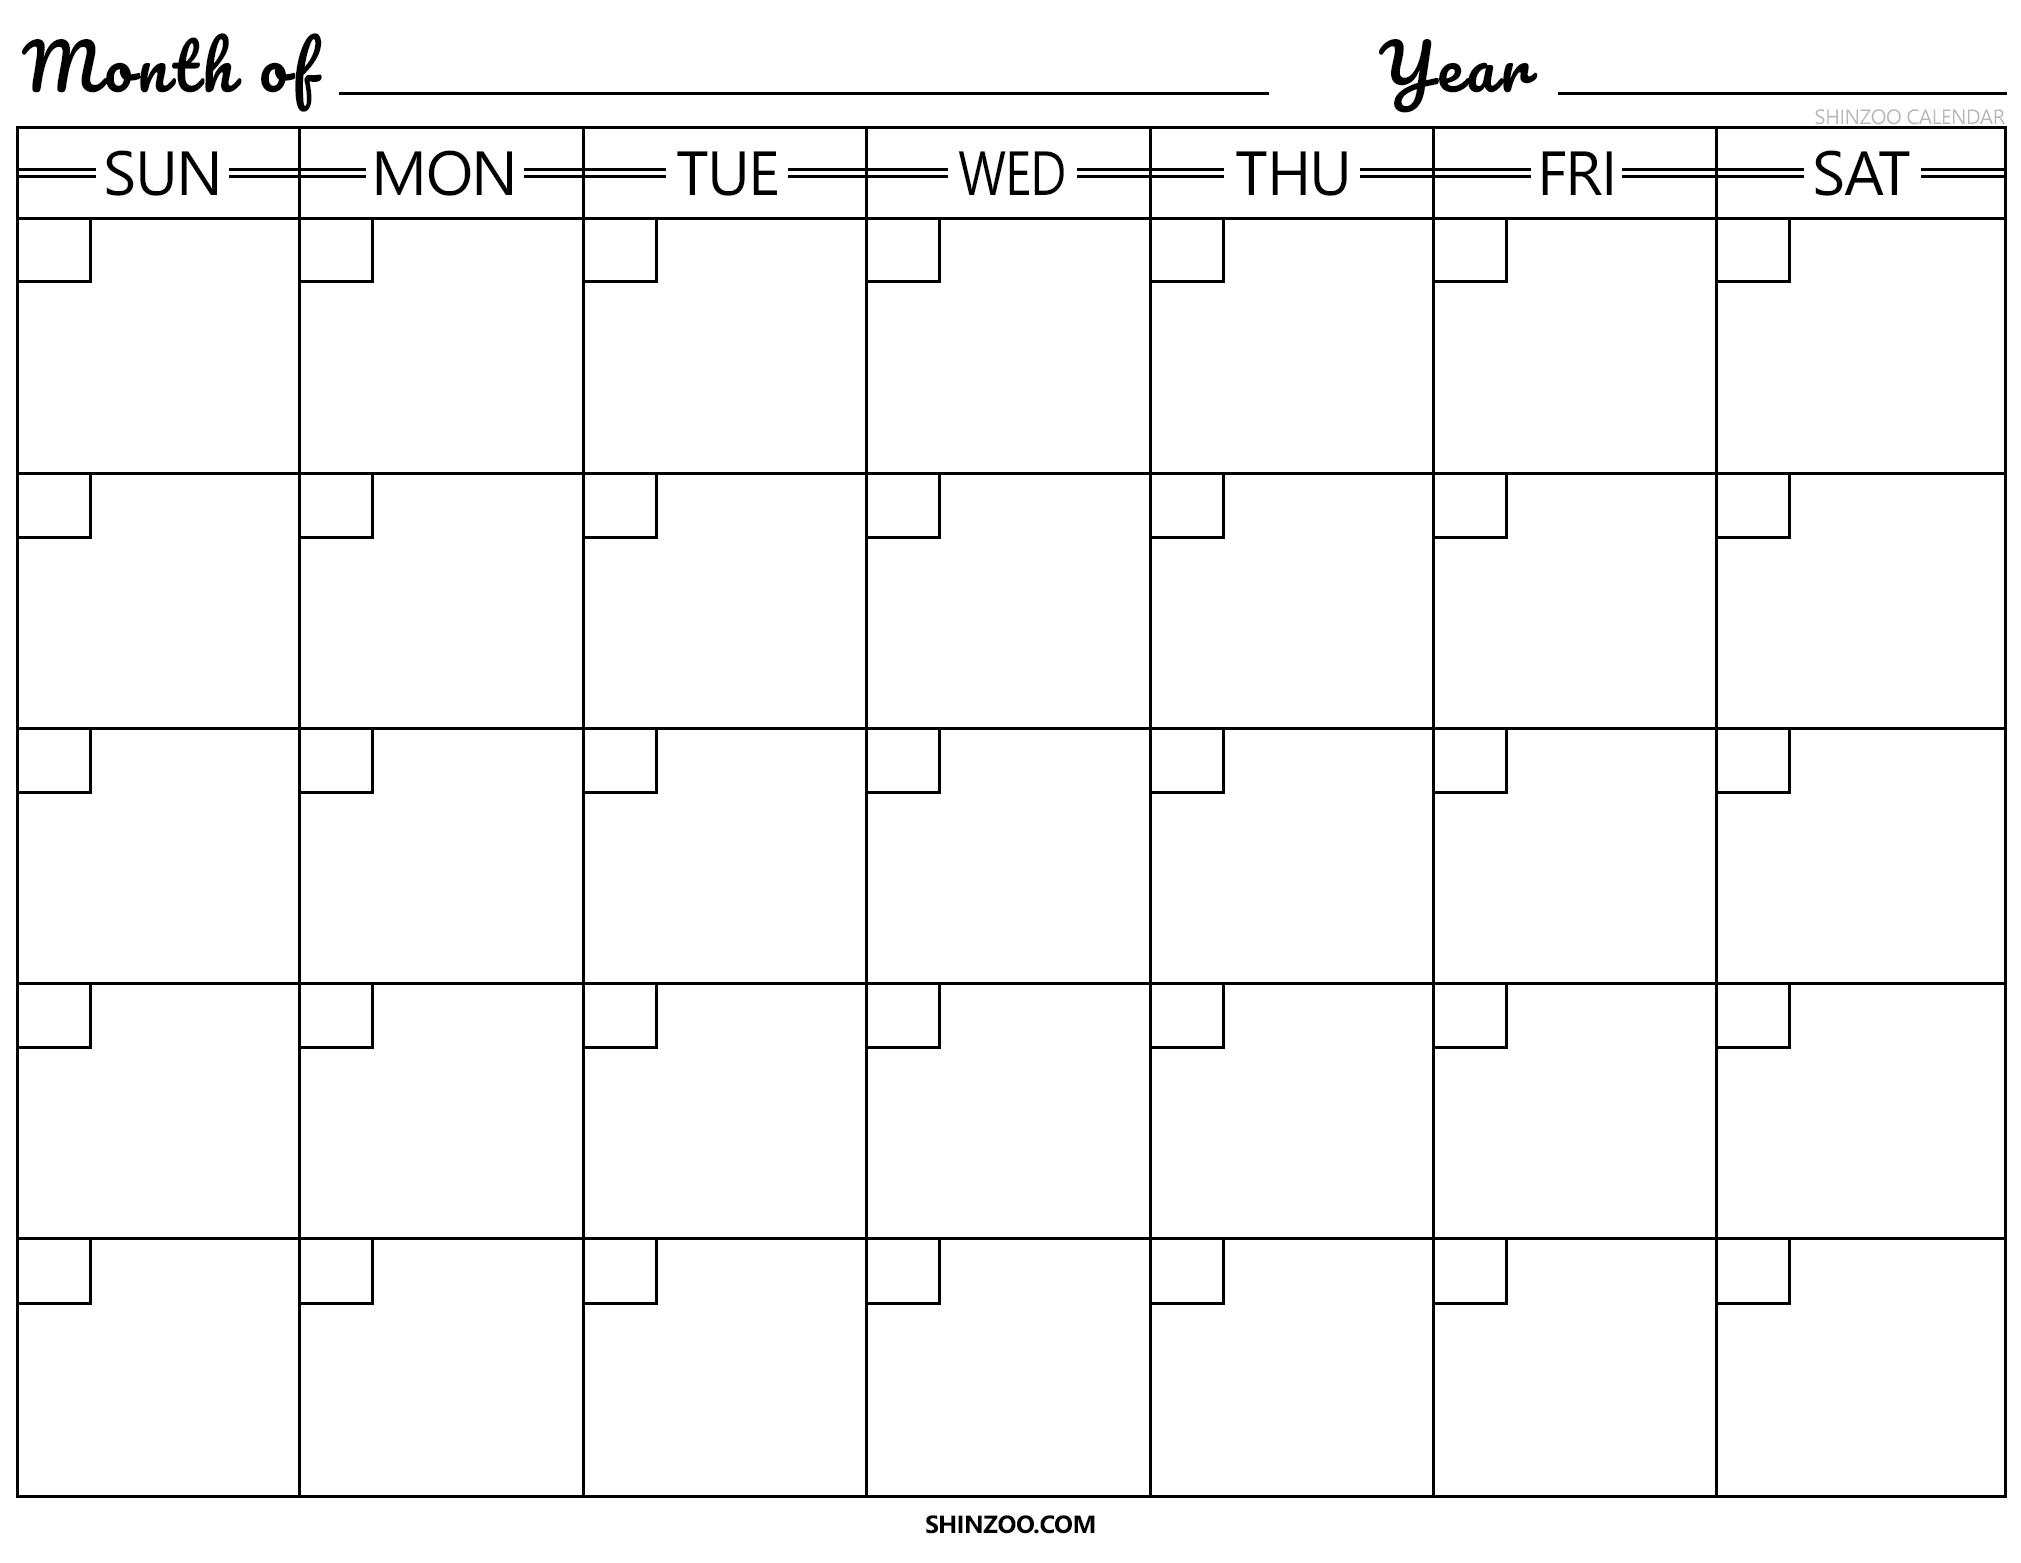 Blank Calendar Template 2019 2020 Printable regarding Fill In The Blank Calendar